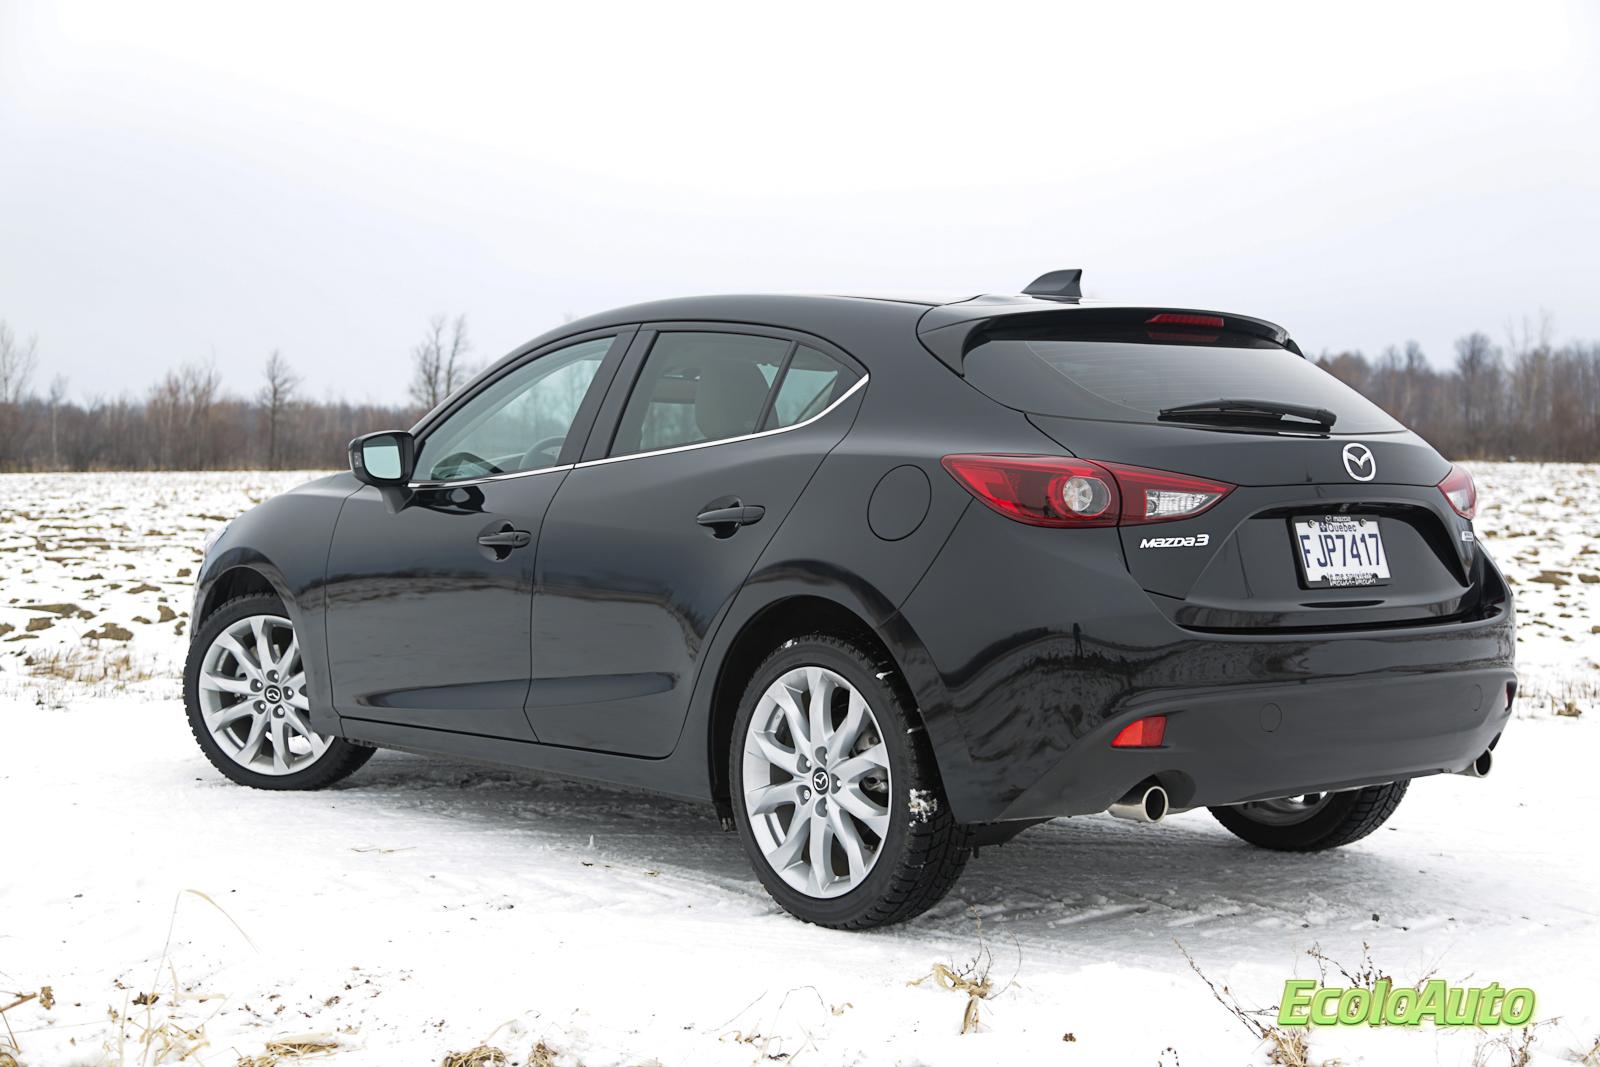 Mazda-3-2014-essai-routier-7